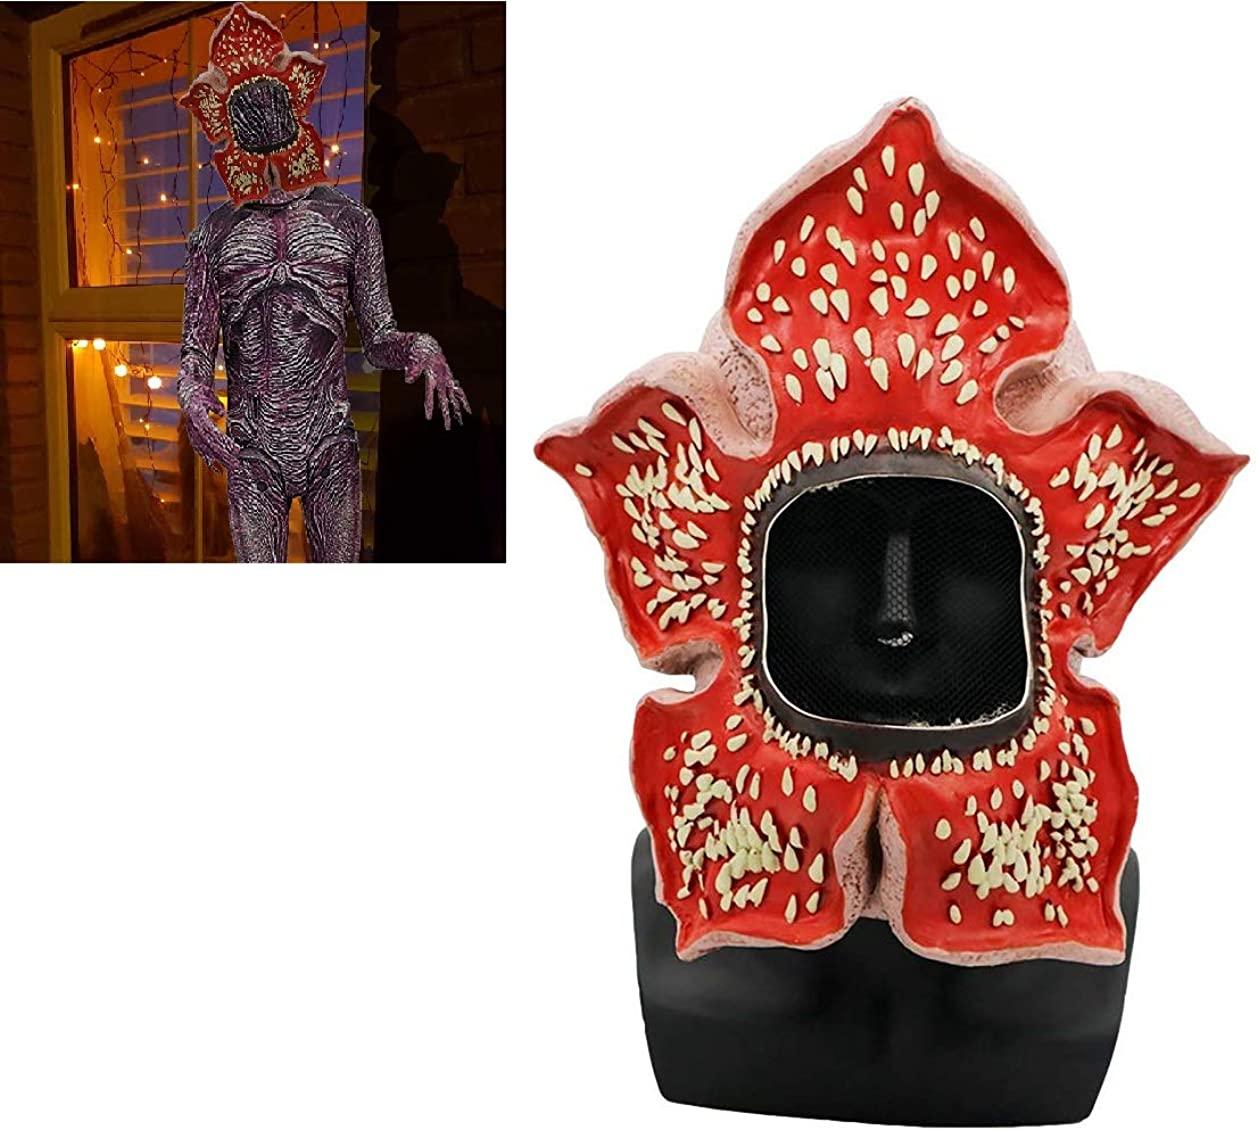 Vercico Stranger Demogorgons Mask Creepy Cosplay Mask Dress Up Headgear Costume Props for Kids Adult Halloween Party Cos Demogorgon Costume Masks Scary Latex Full Head Masks for